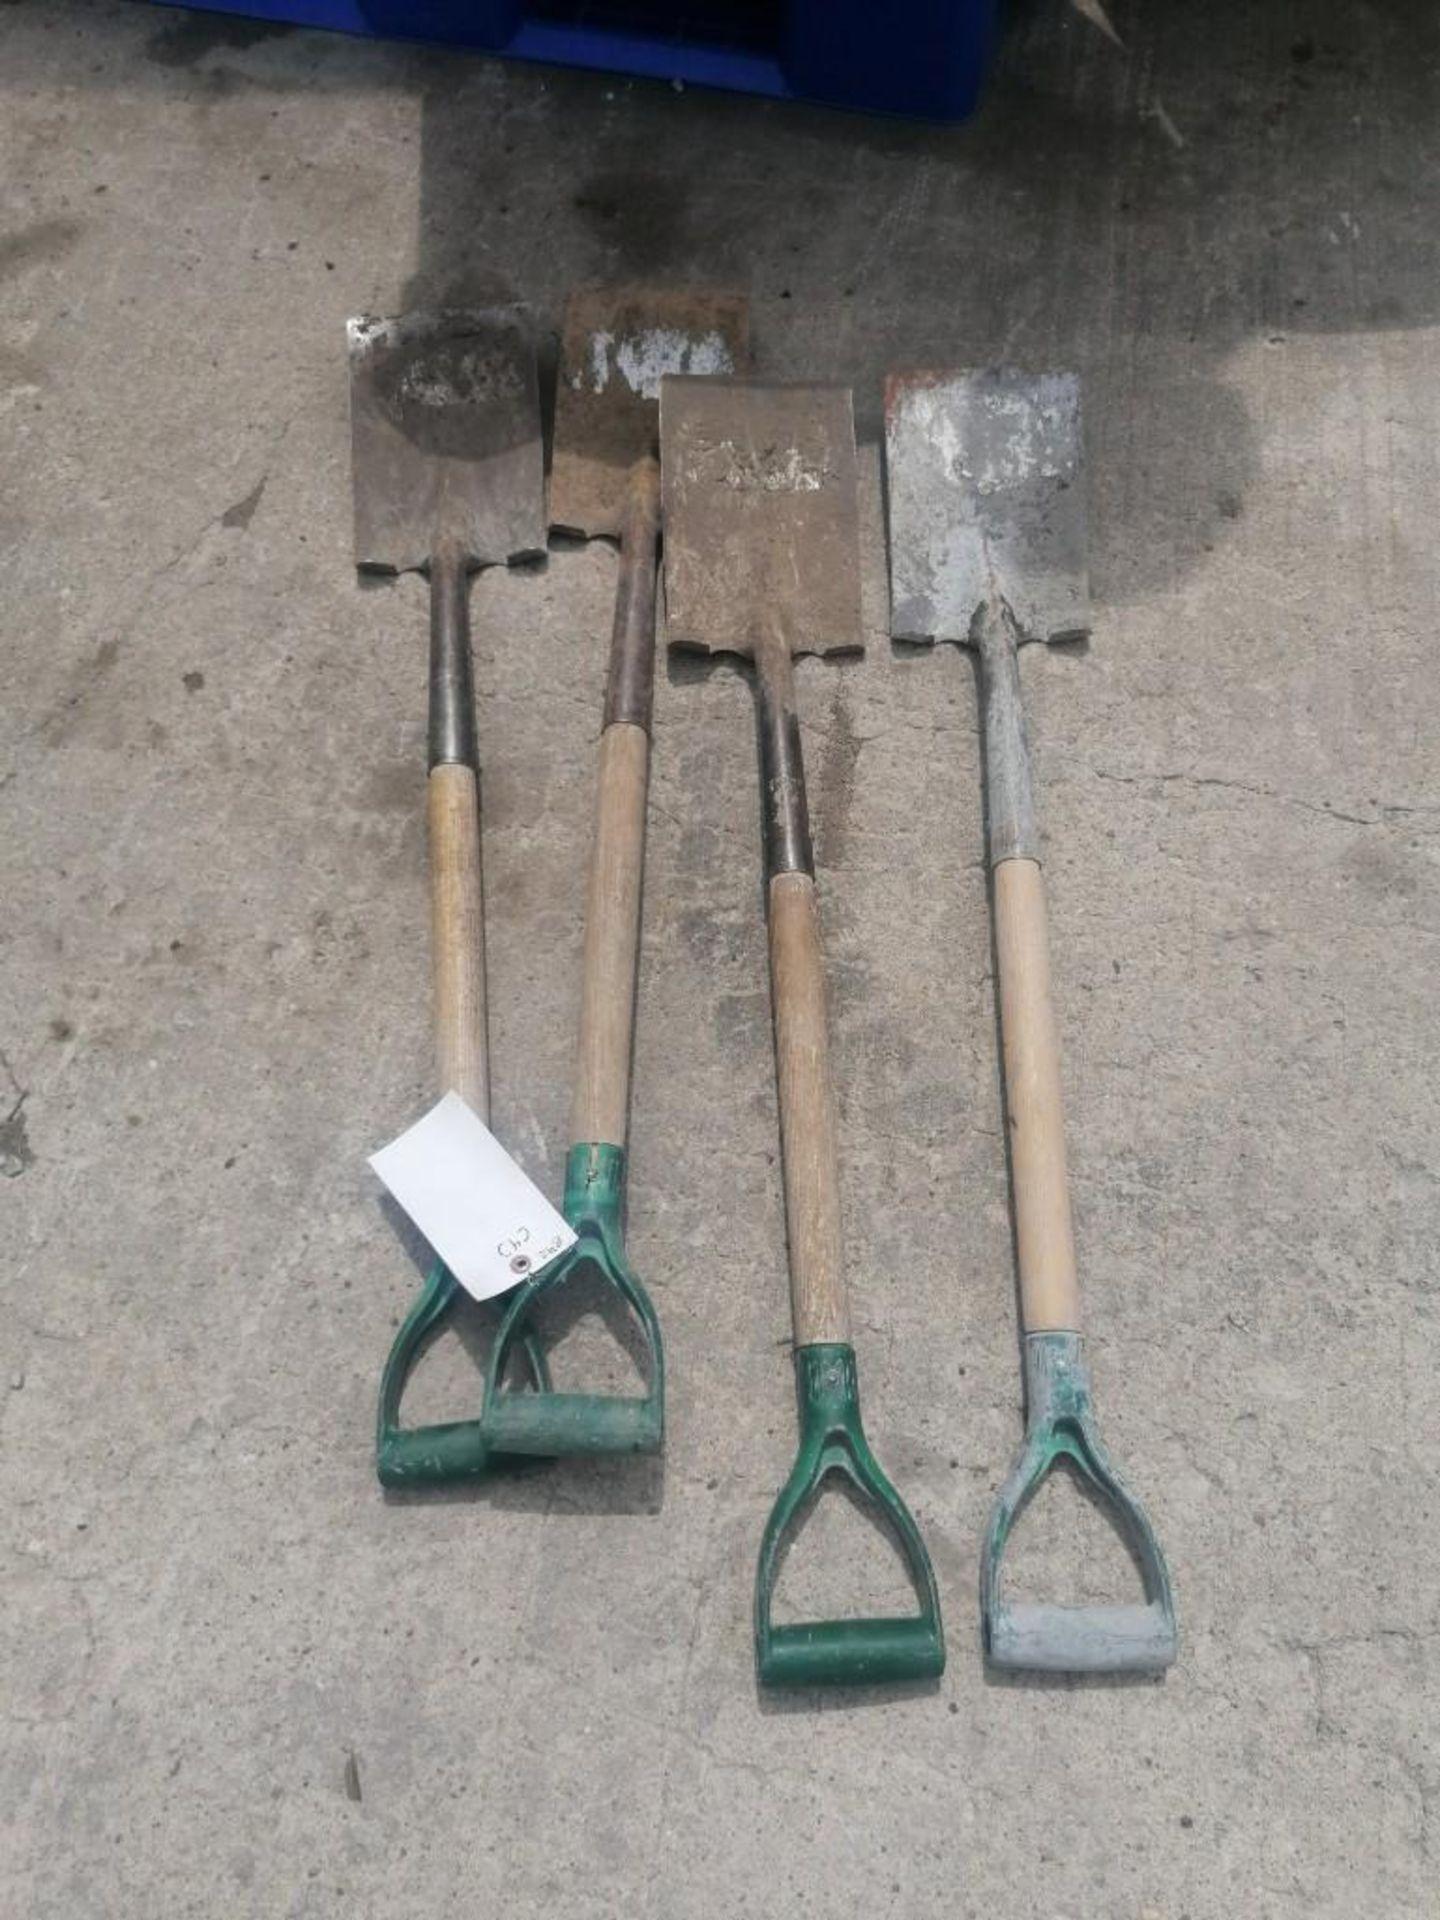 Lot 57 - (4) Shovels. Located at 301 E Henry Street, Mt. Pleasant, IA 52641.